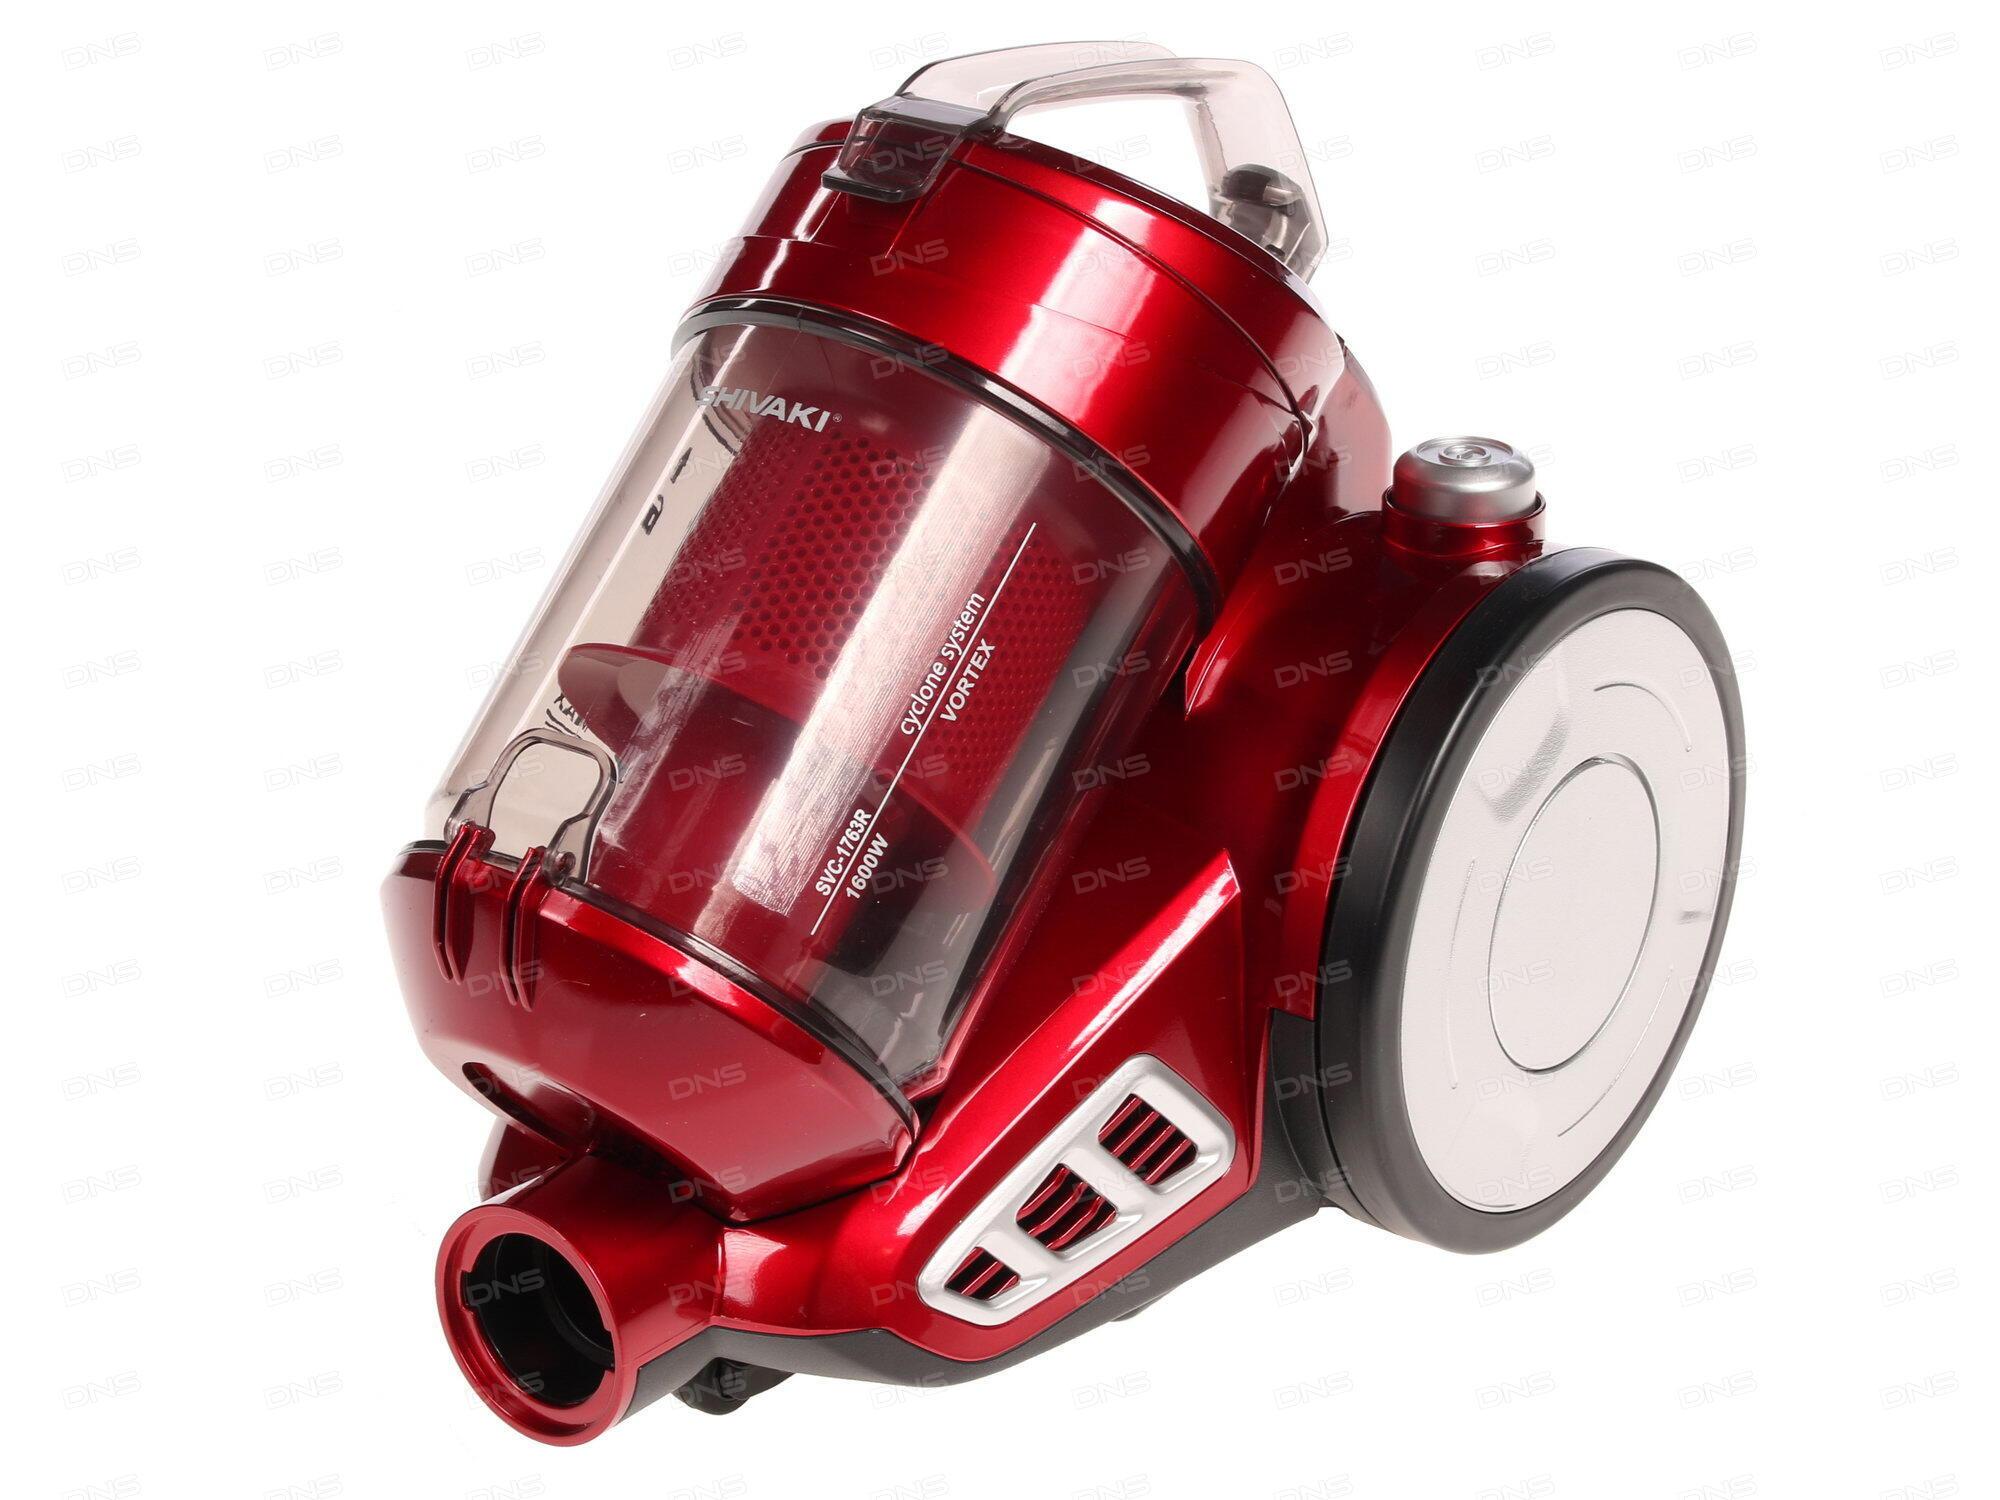 Пылесос LG VK76A06NDR сухая уборка красный серый